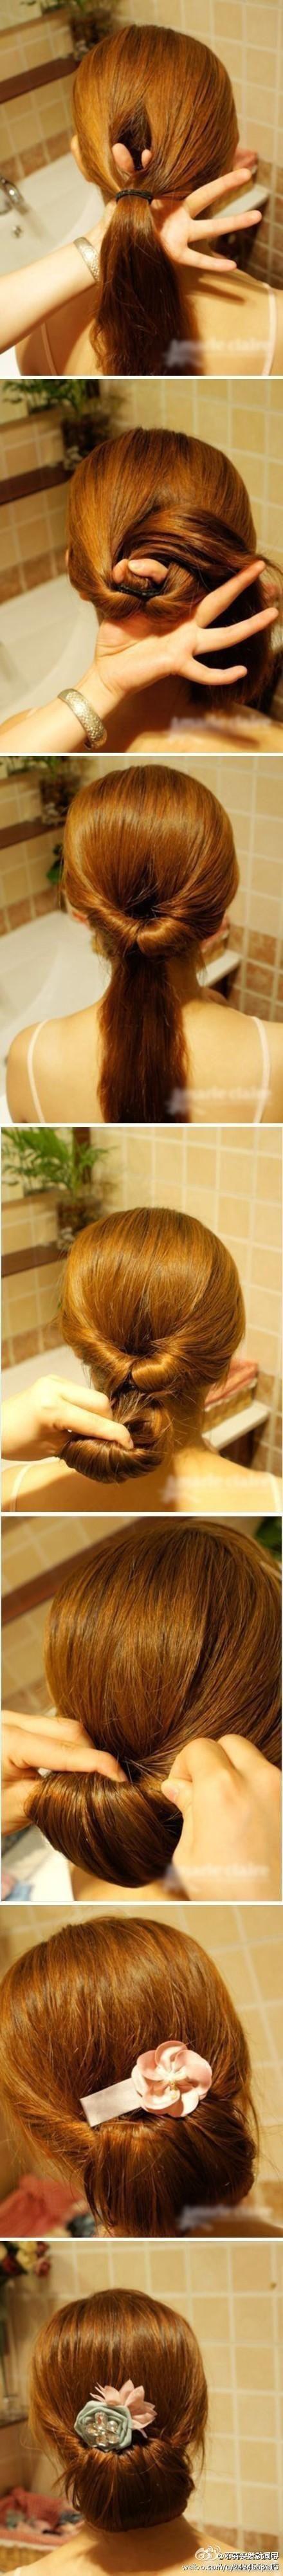 inverted ponytail bun